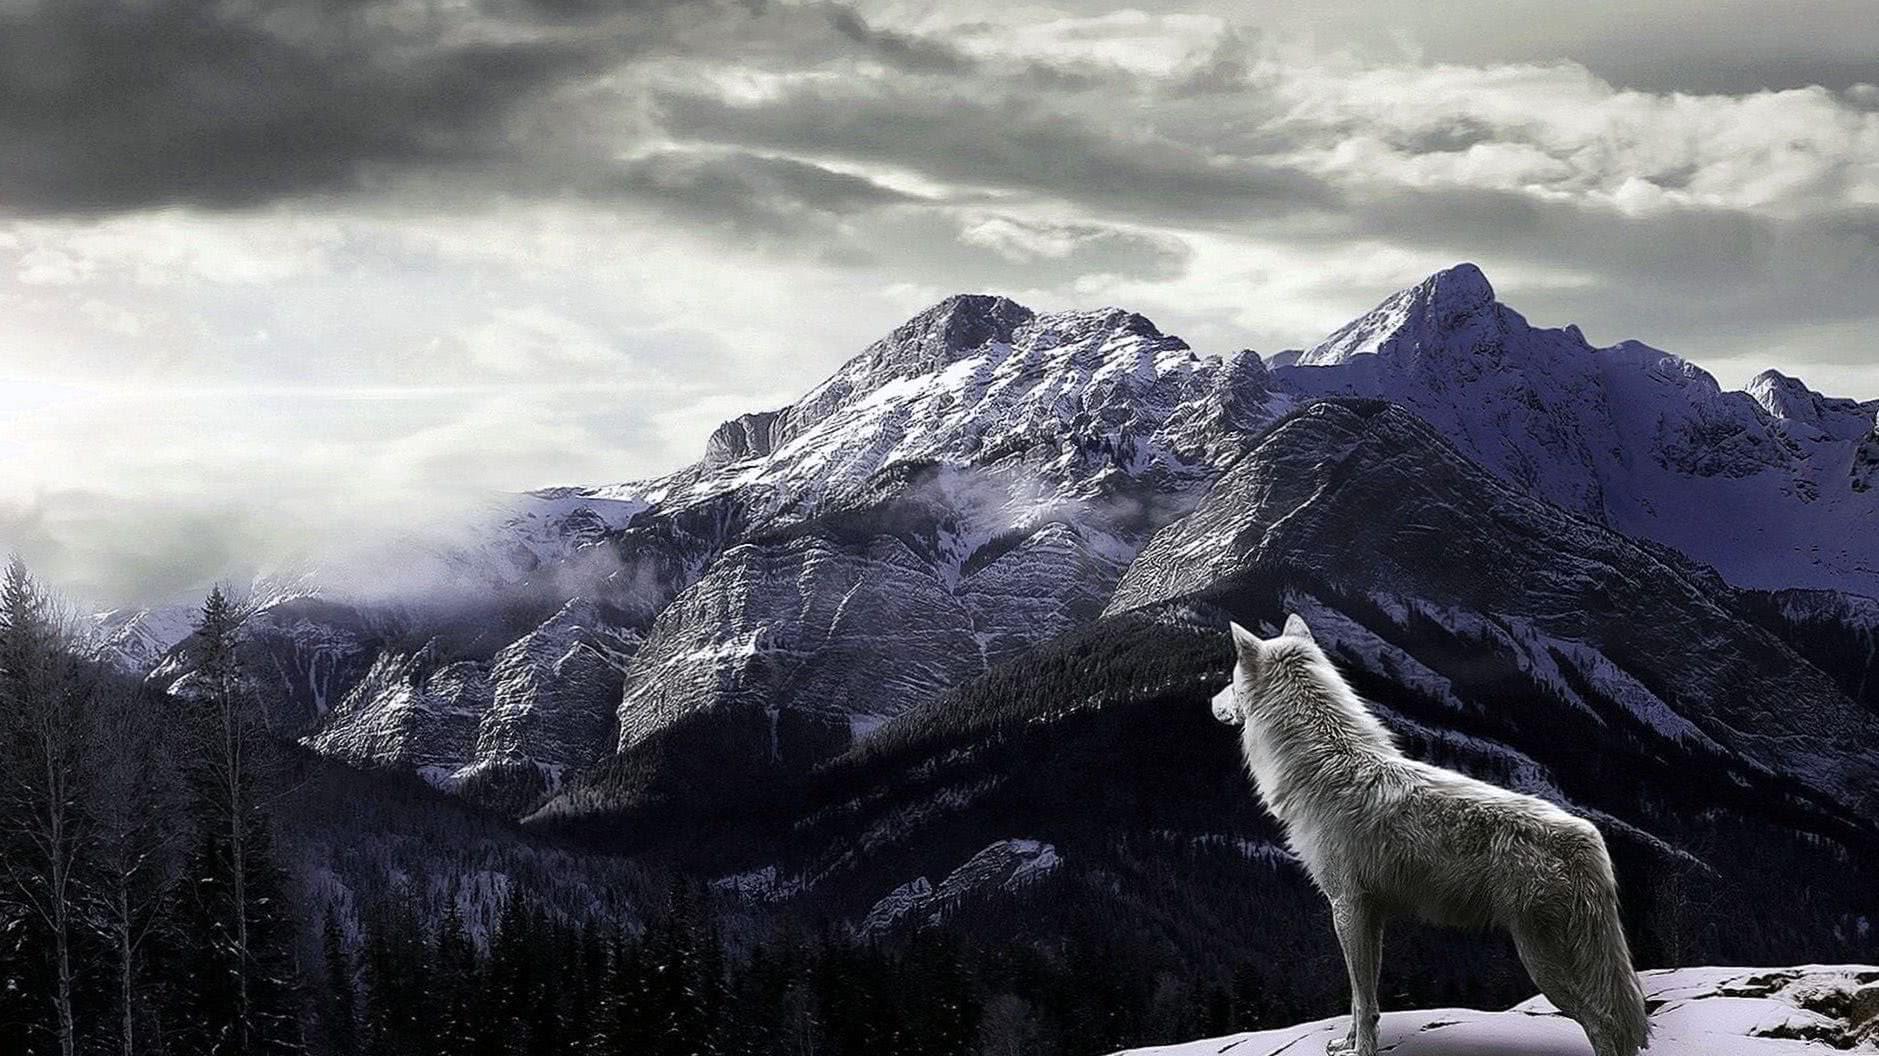 Wallpaper Full HD 4K Wolf